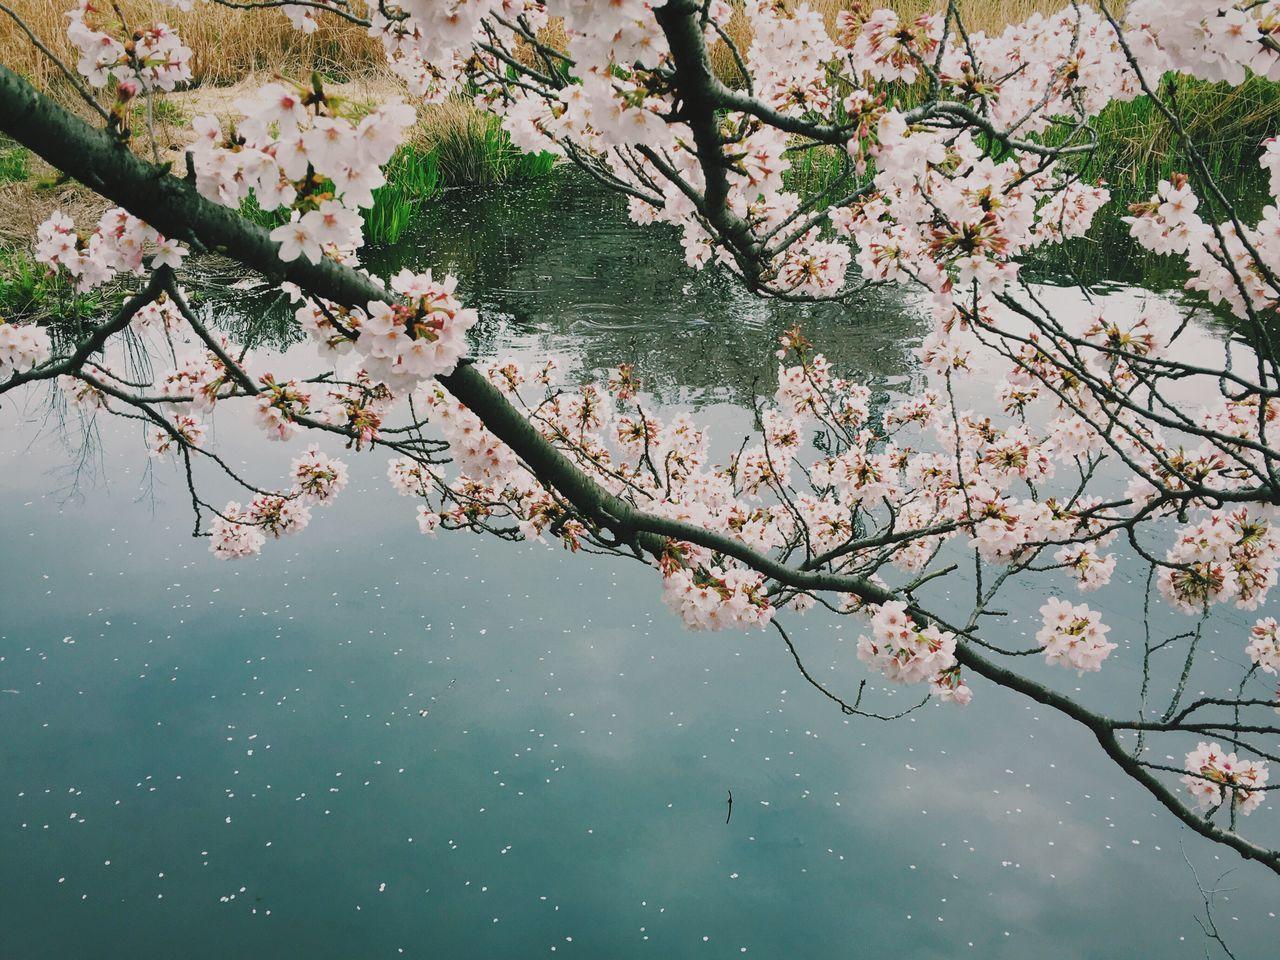 Sakura Cherryblossom Spring In Japan 水辺の桜 In Bloom